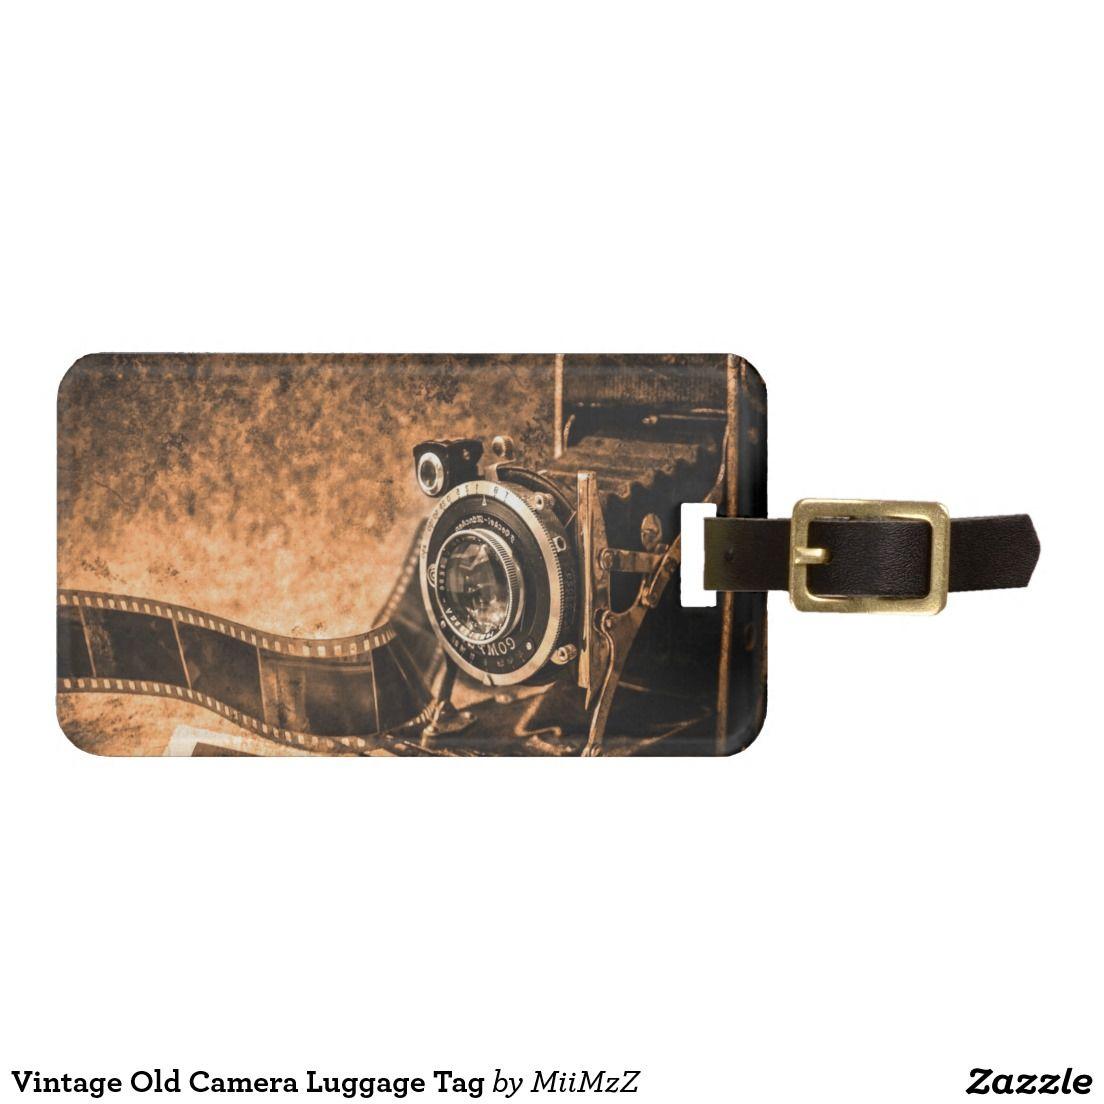 Vintage Old Camera Luggage Tag